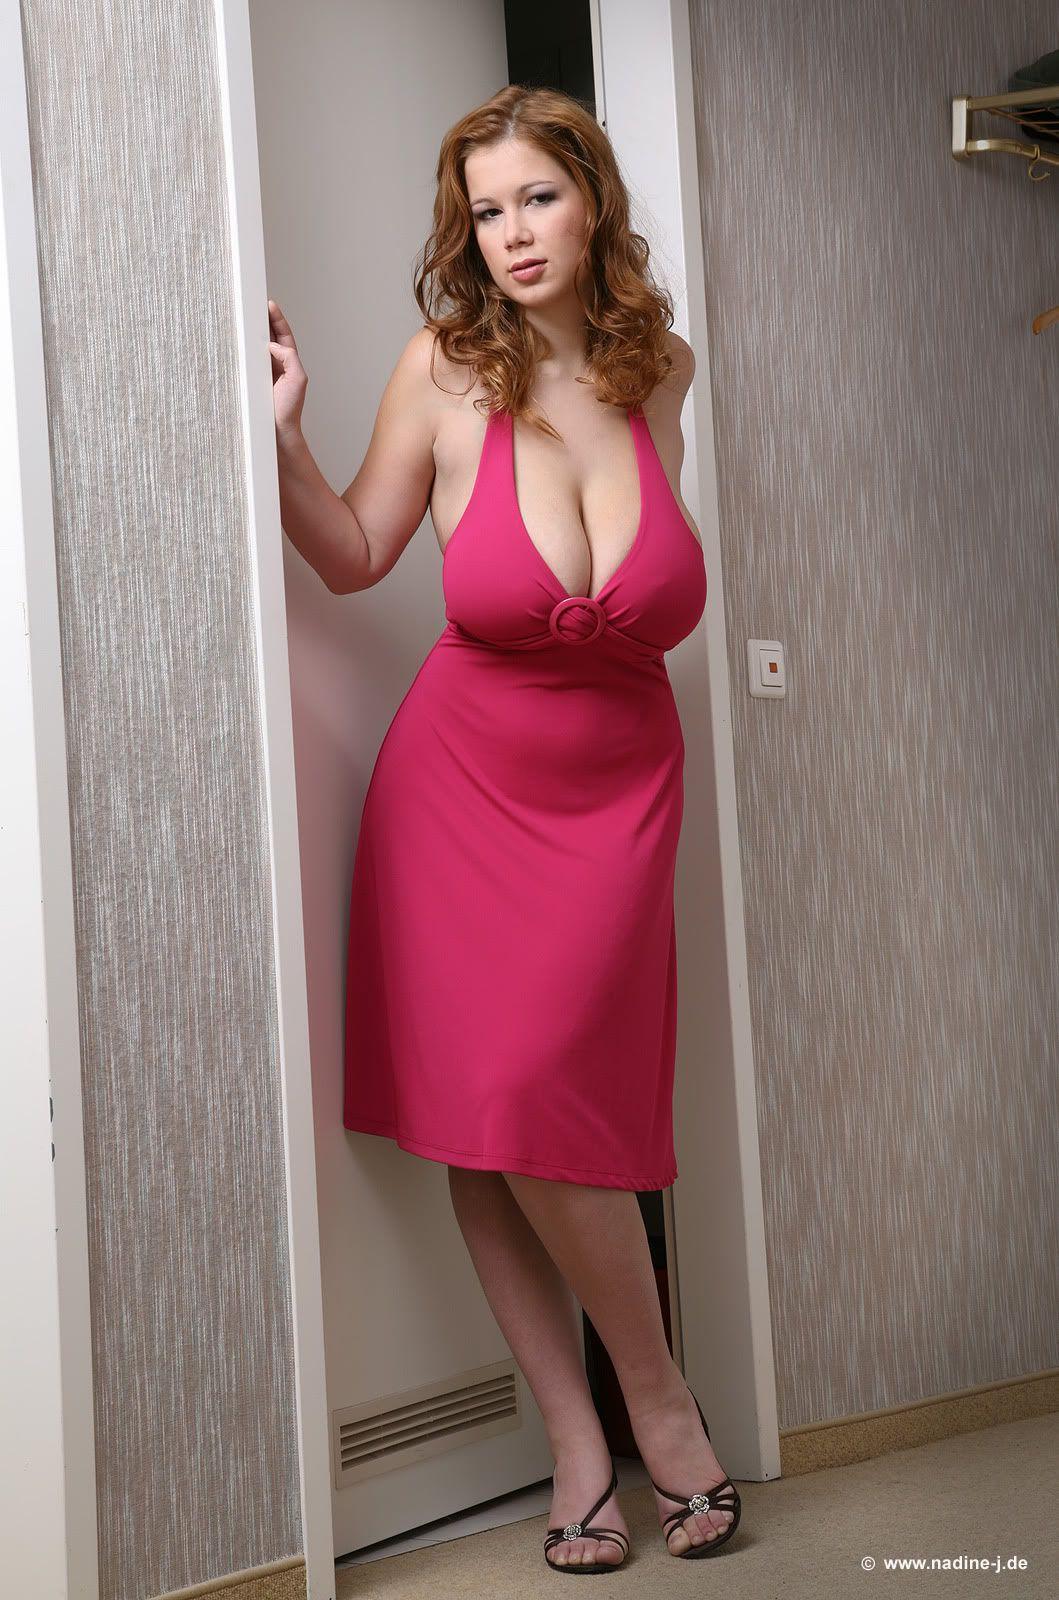 Terry Nova   big b   Pinterest   Curves, Satin and Models